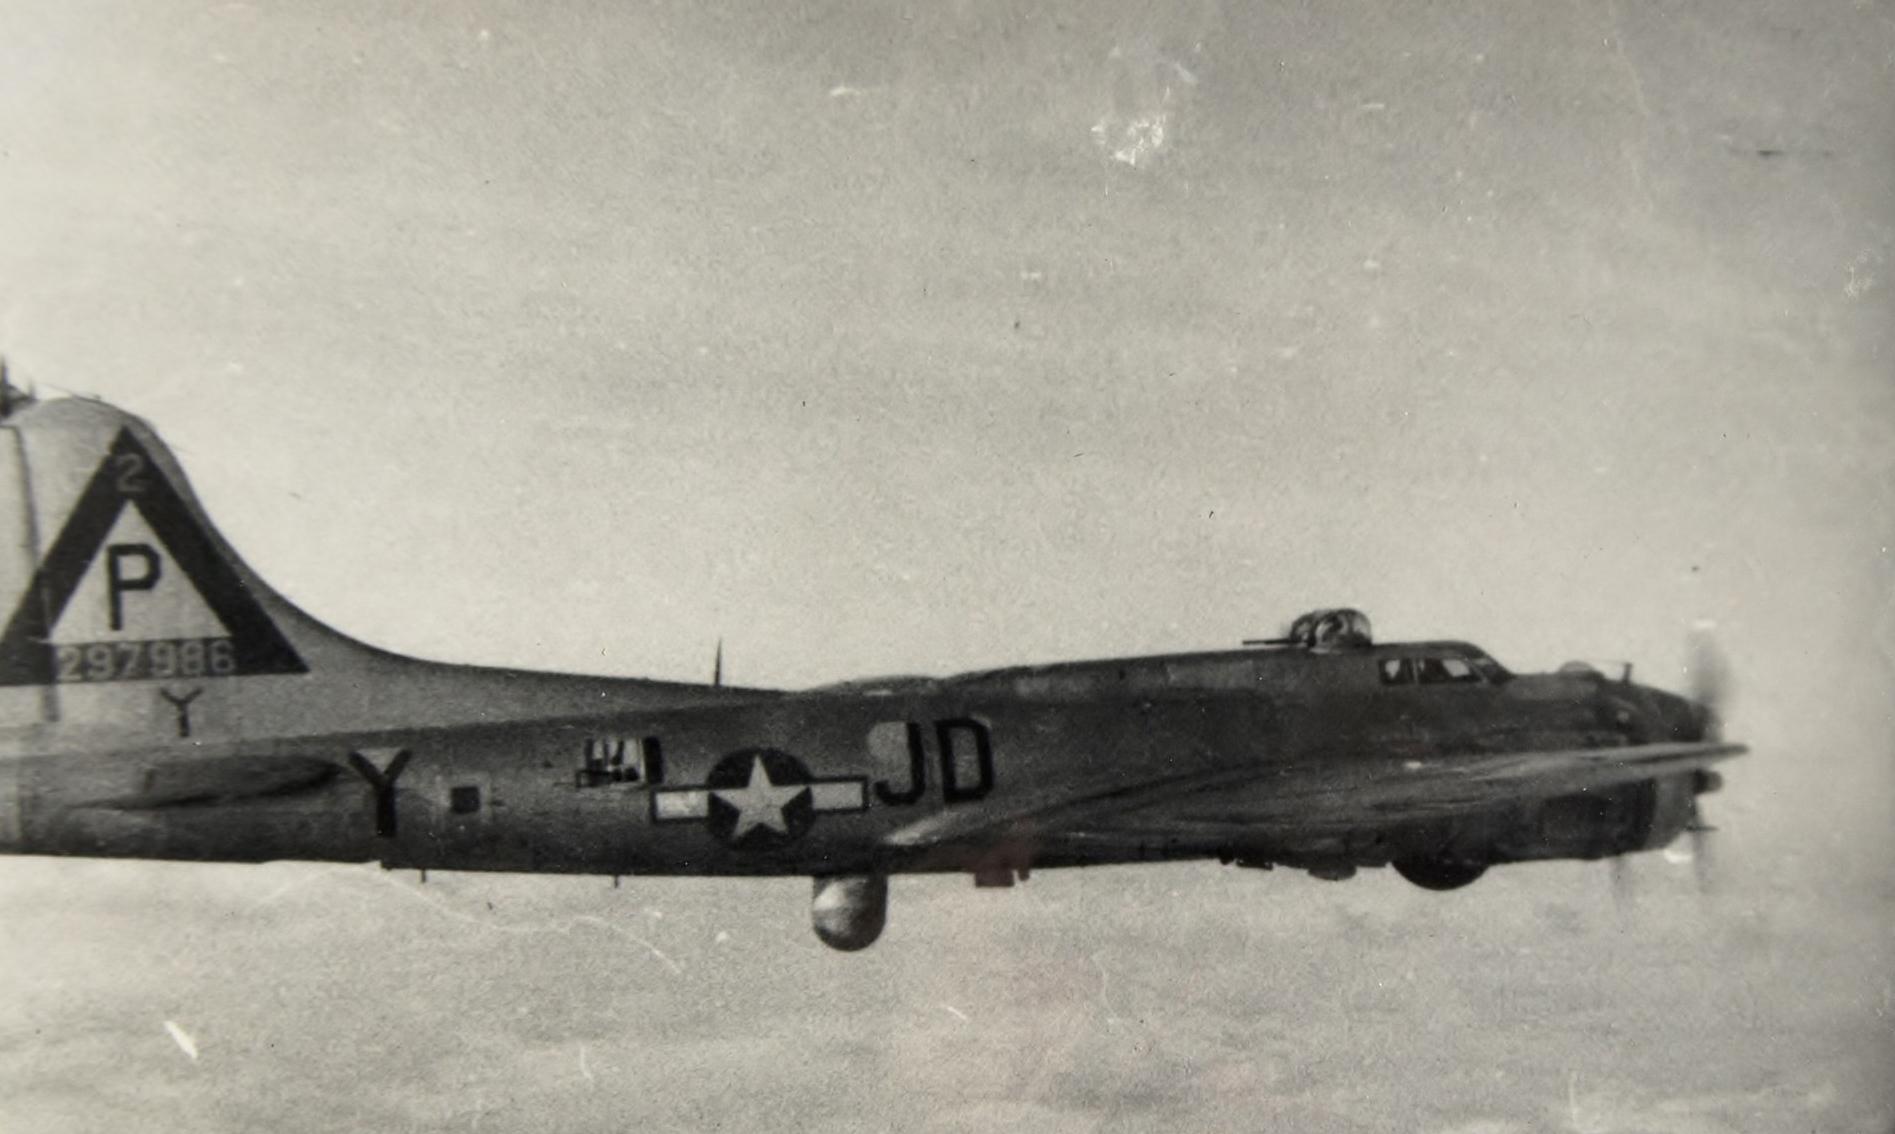 B-17 #42-97986